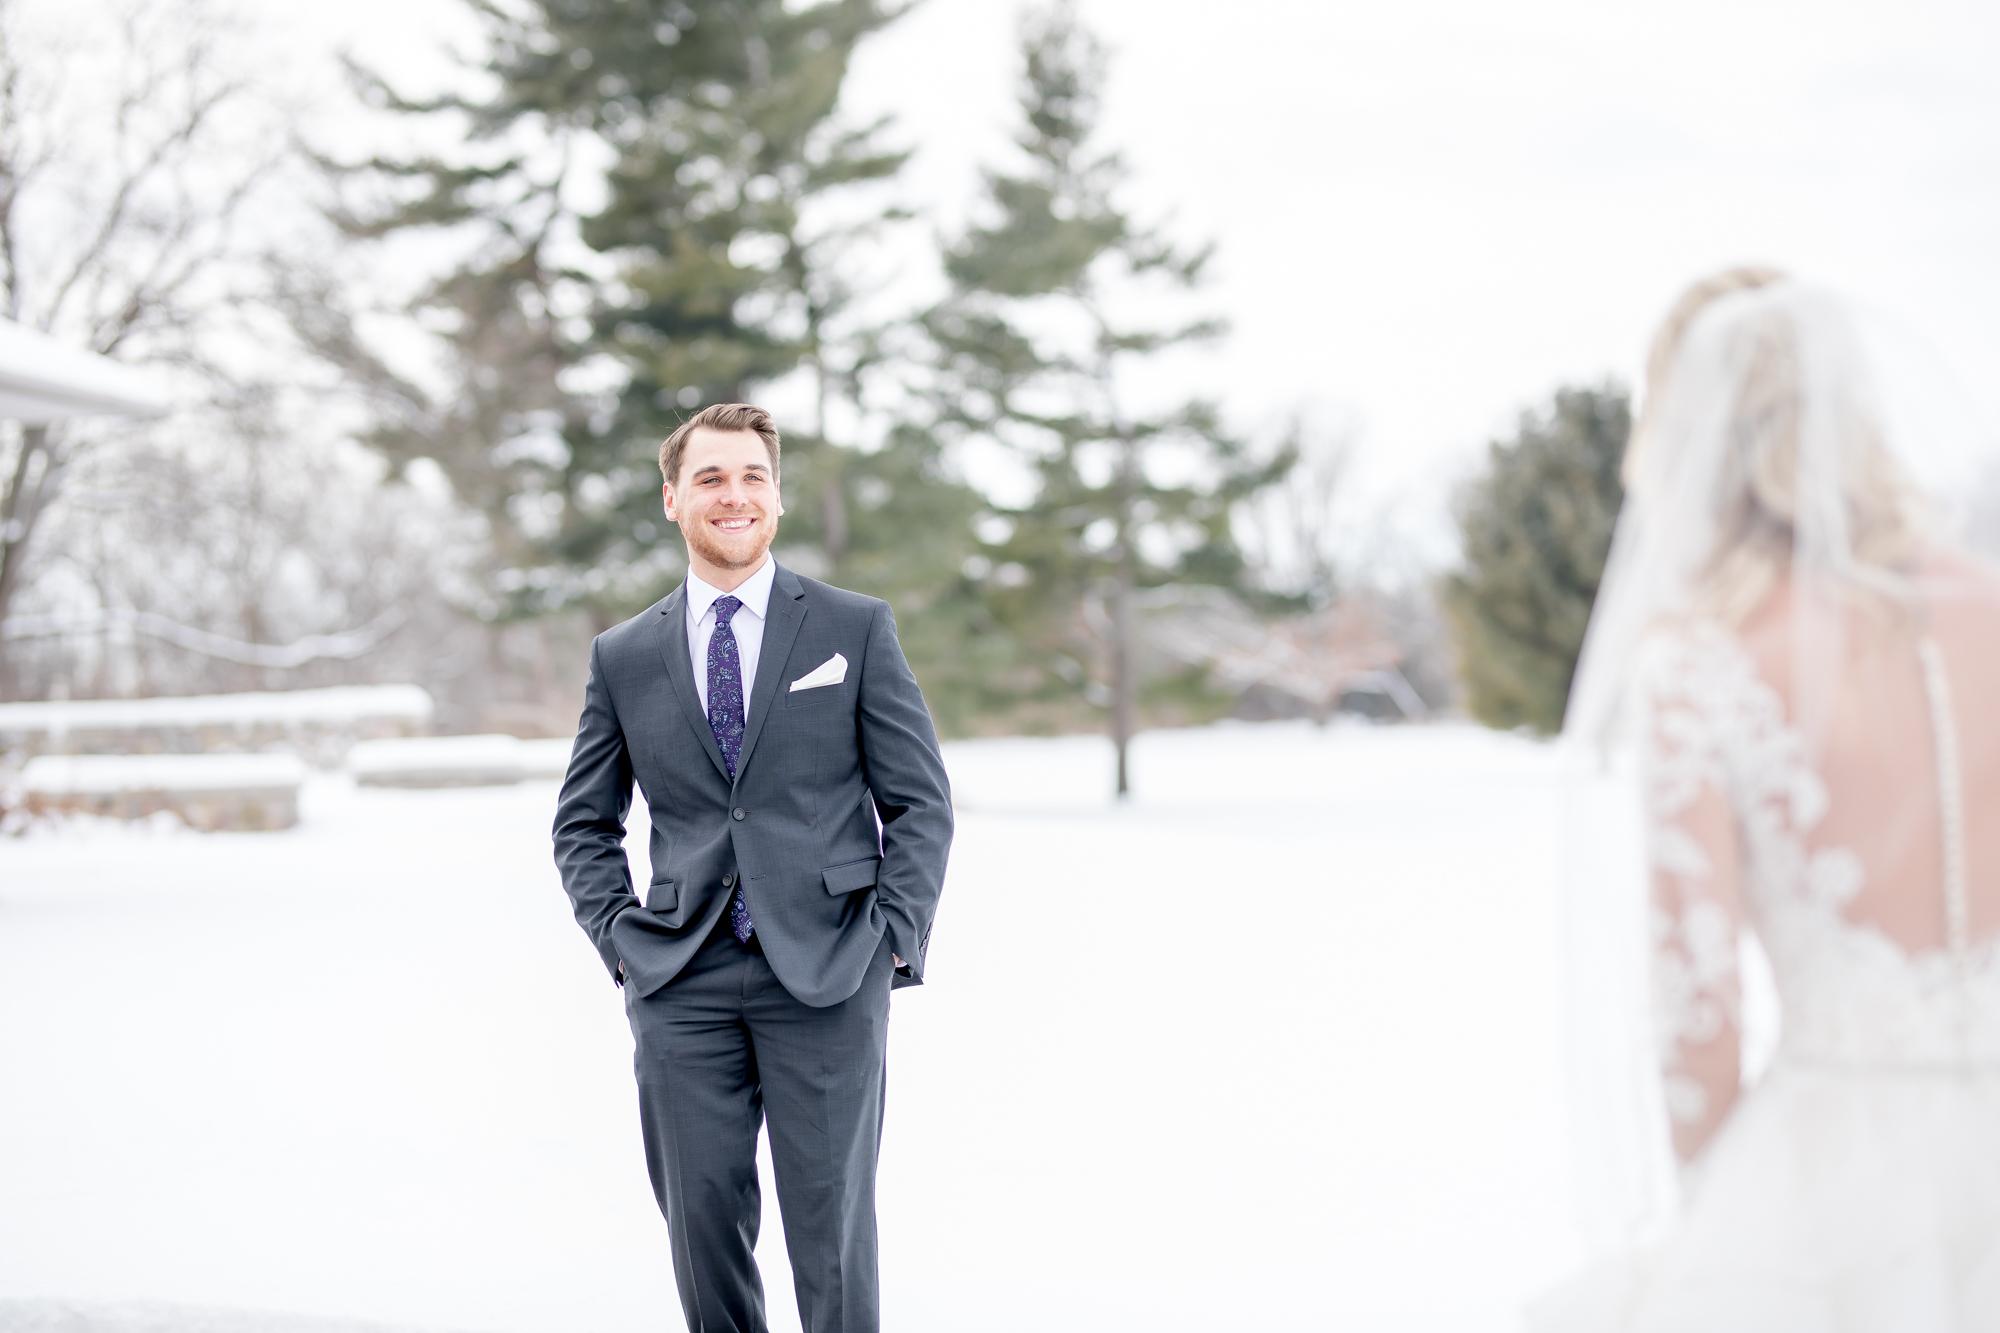 Rockford_Michigan,_Winter_Wedding,_Christina_Leskovar_Photography,_Blythfield_Country_Club-3.jpg